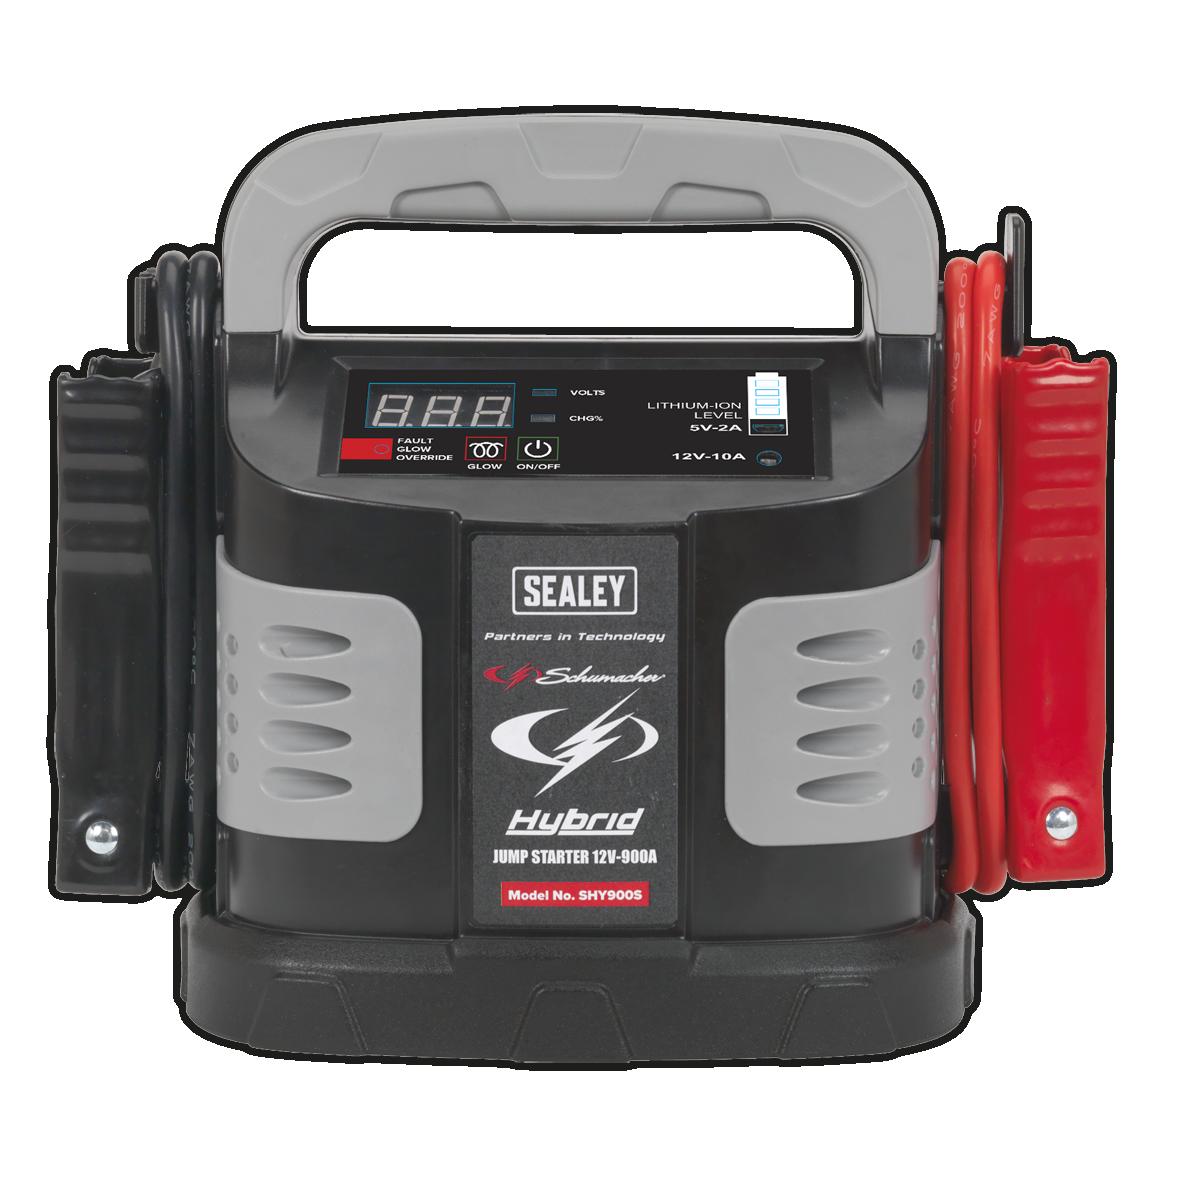 Sealey Shy900s Schumacher Hybrid Ultra Capacitor Jump